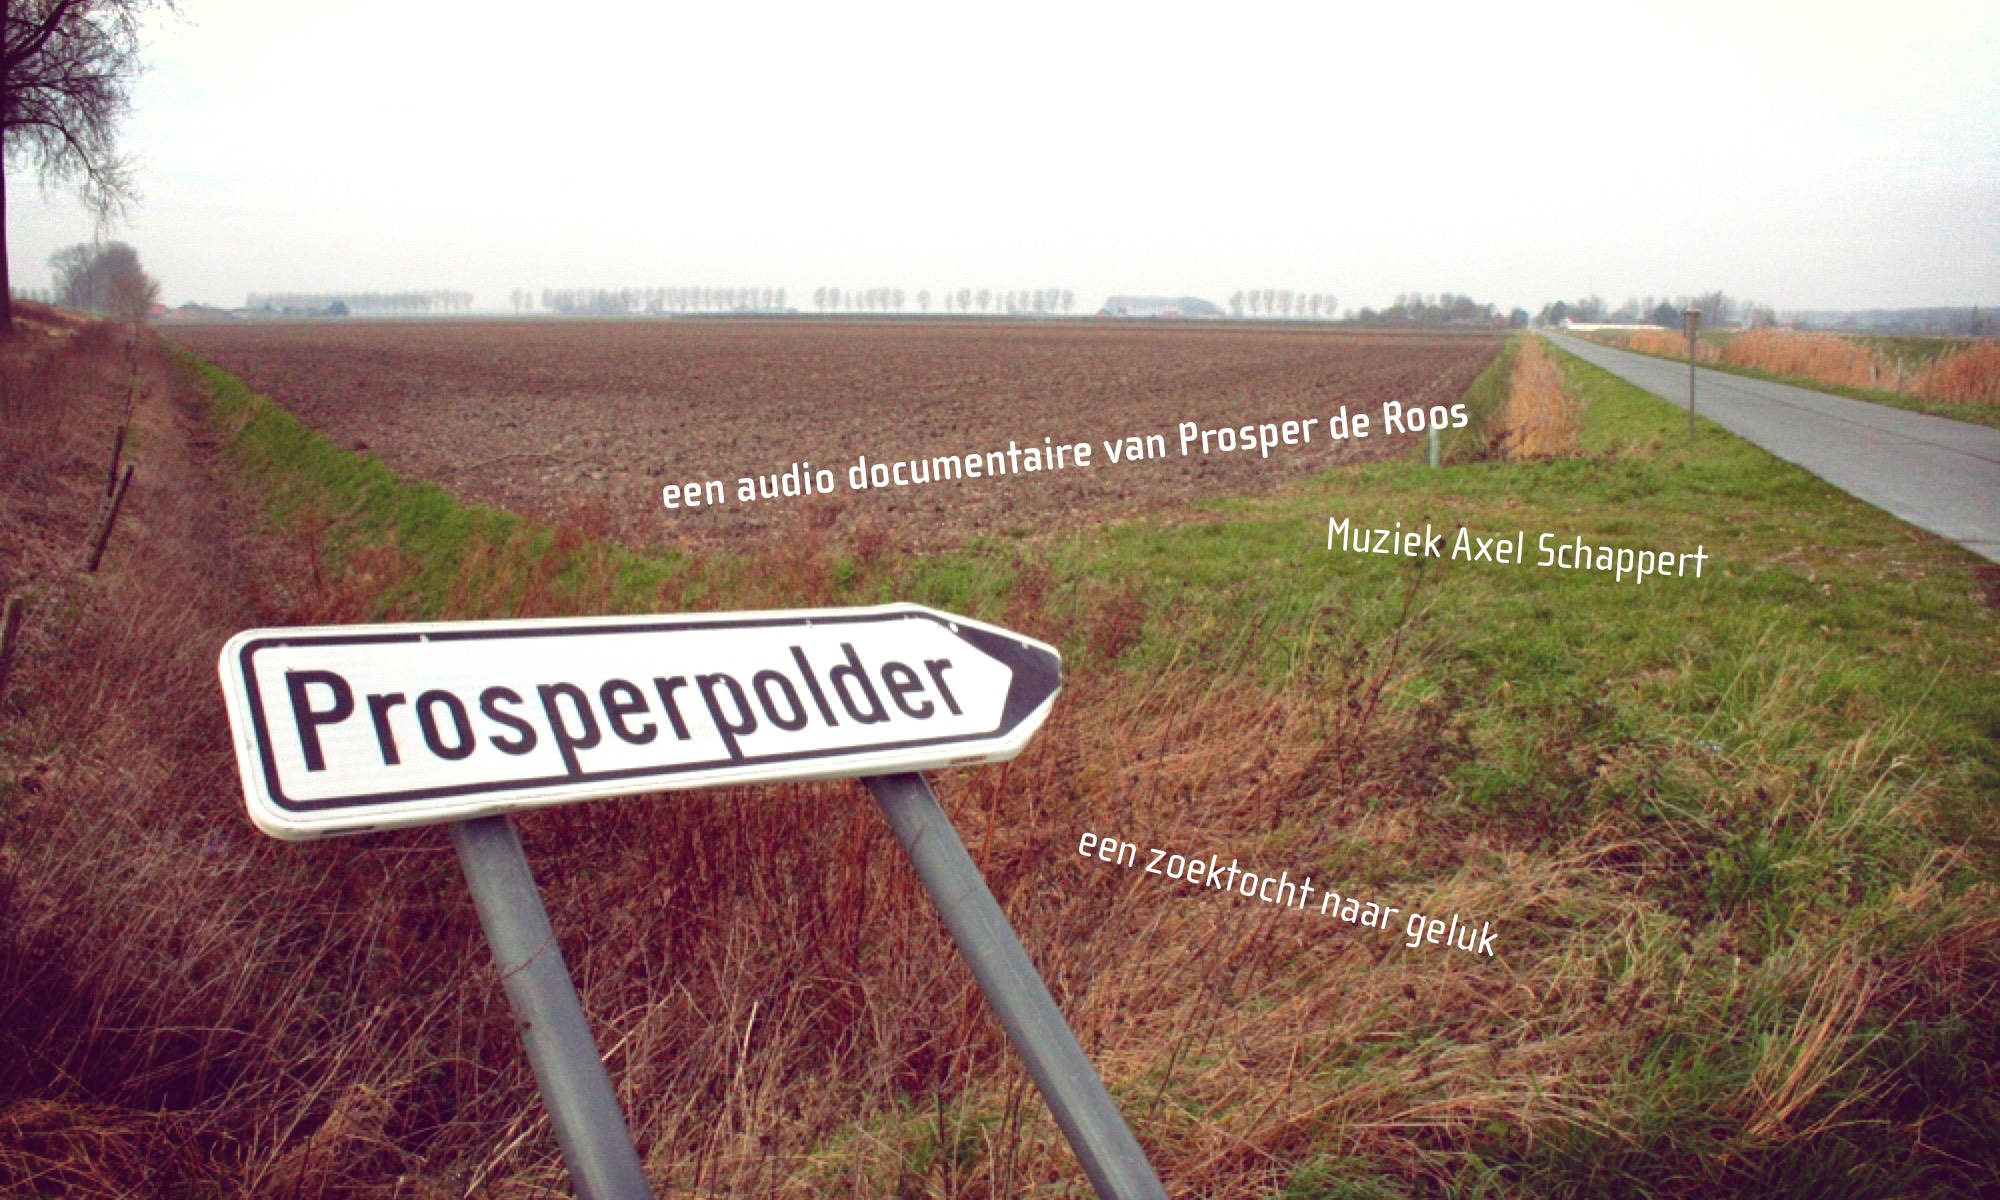 Prosper de Roos